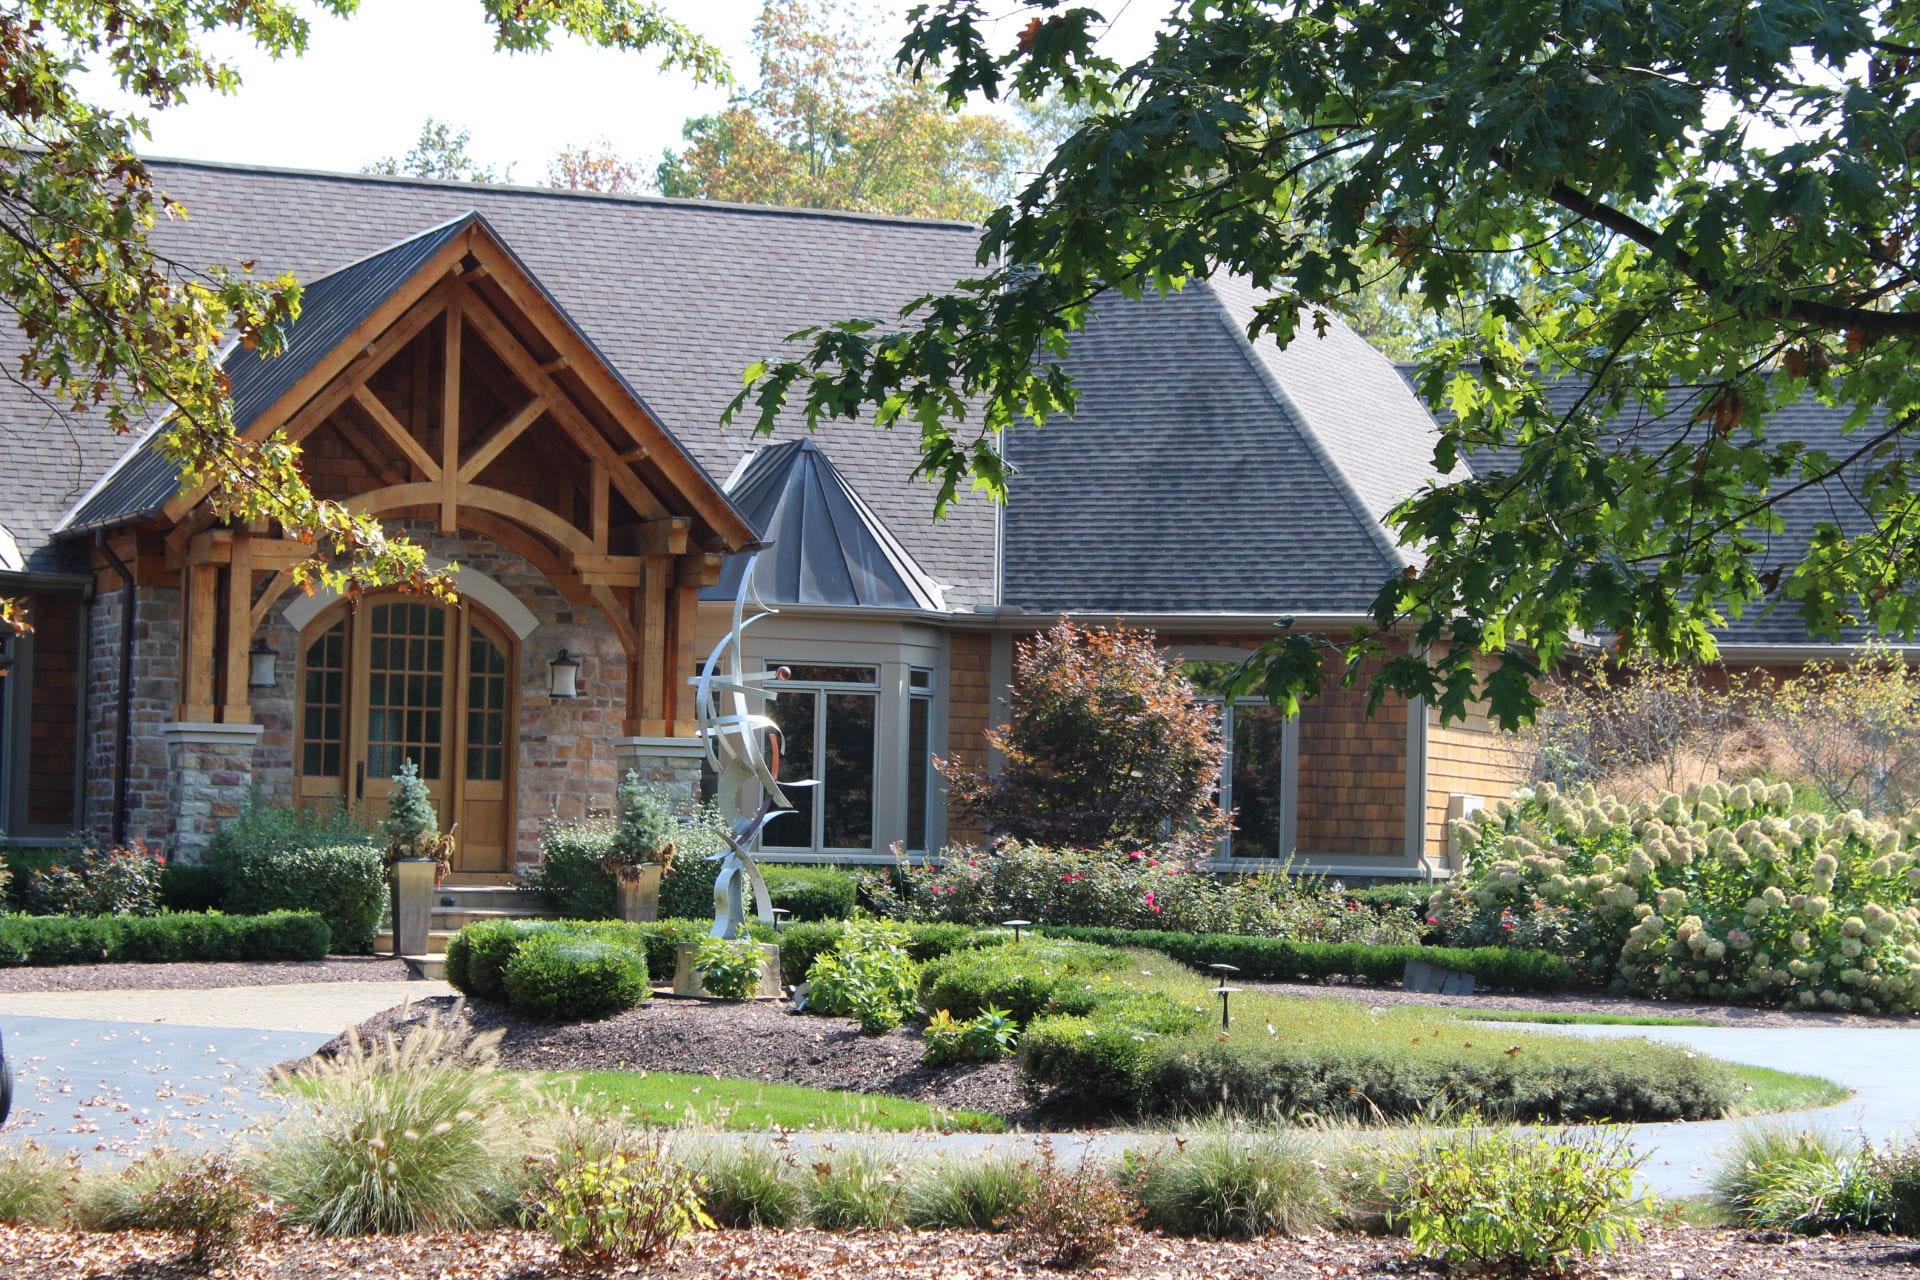 Home Furnishings, Housewares, Décor & More